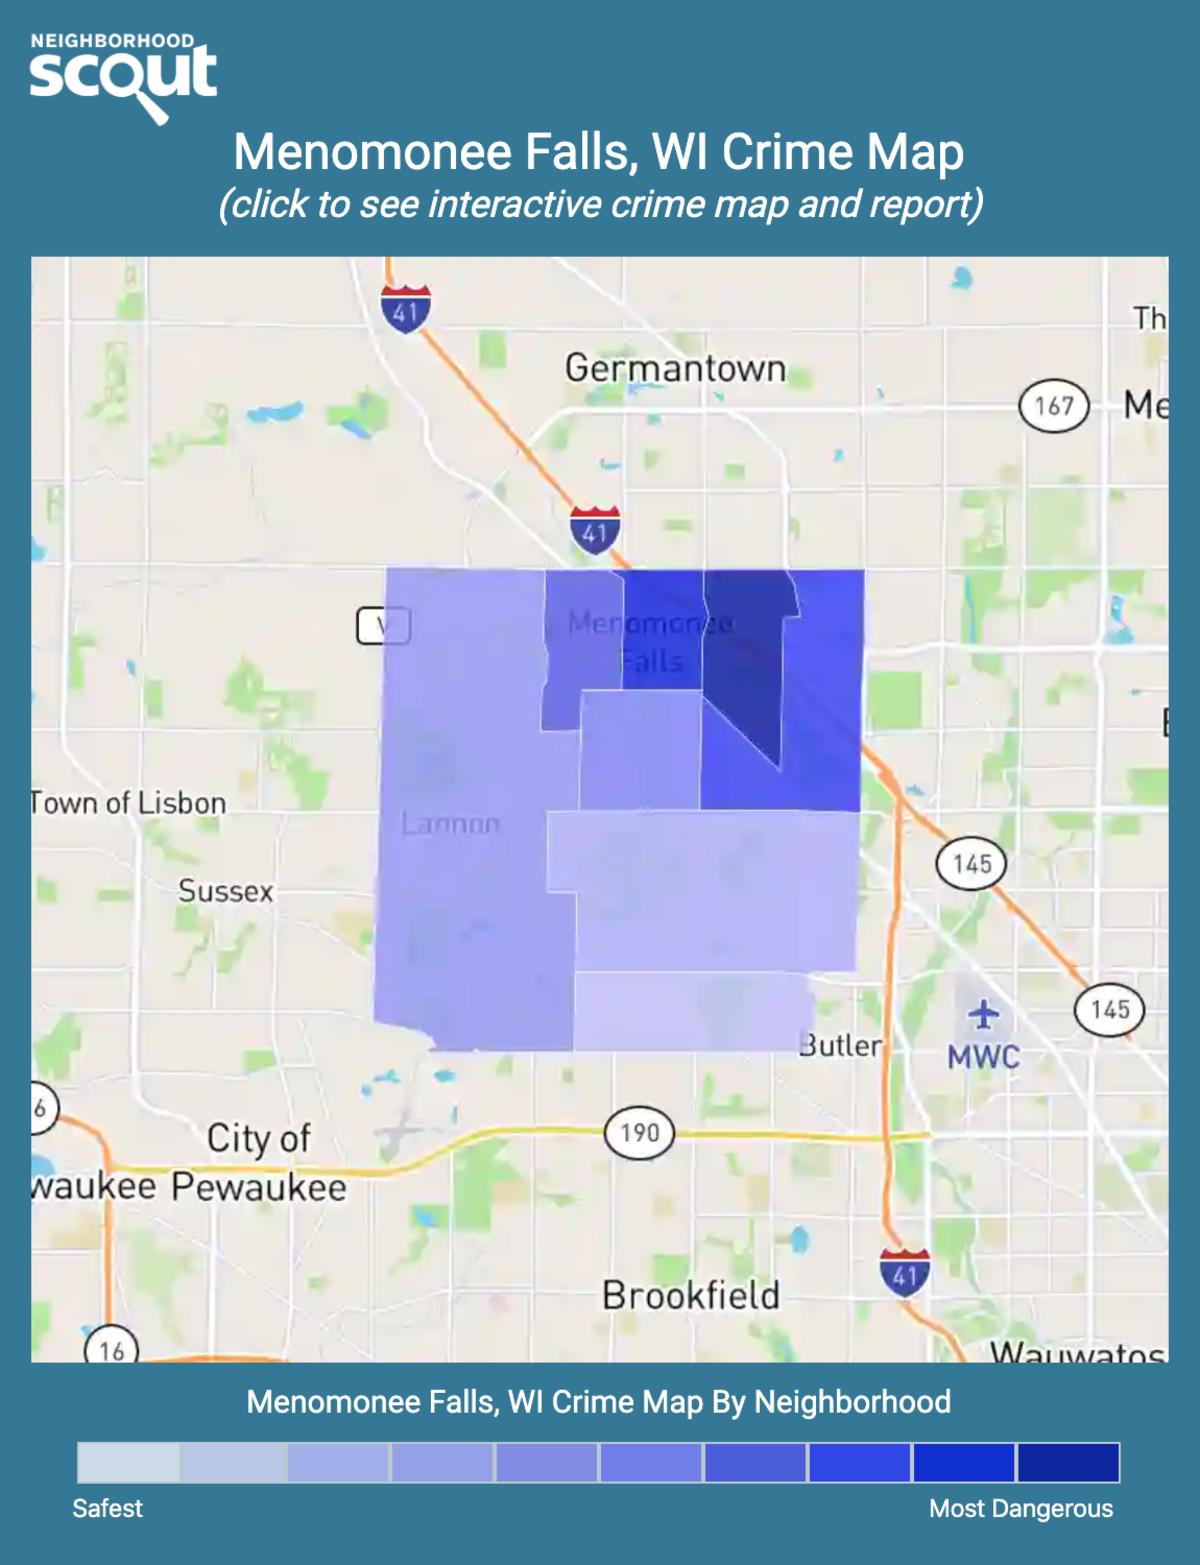 Menomonee Falls, Wisconsin crime map